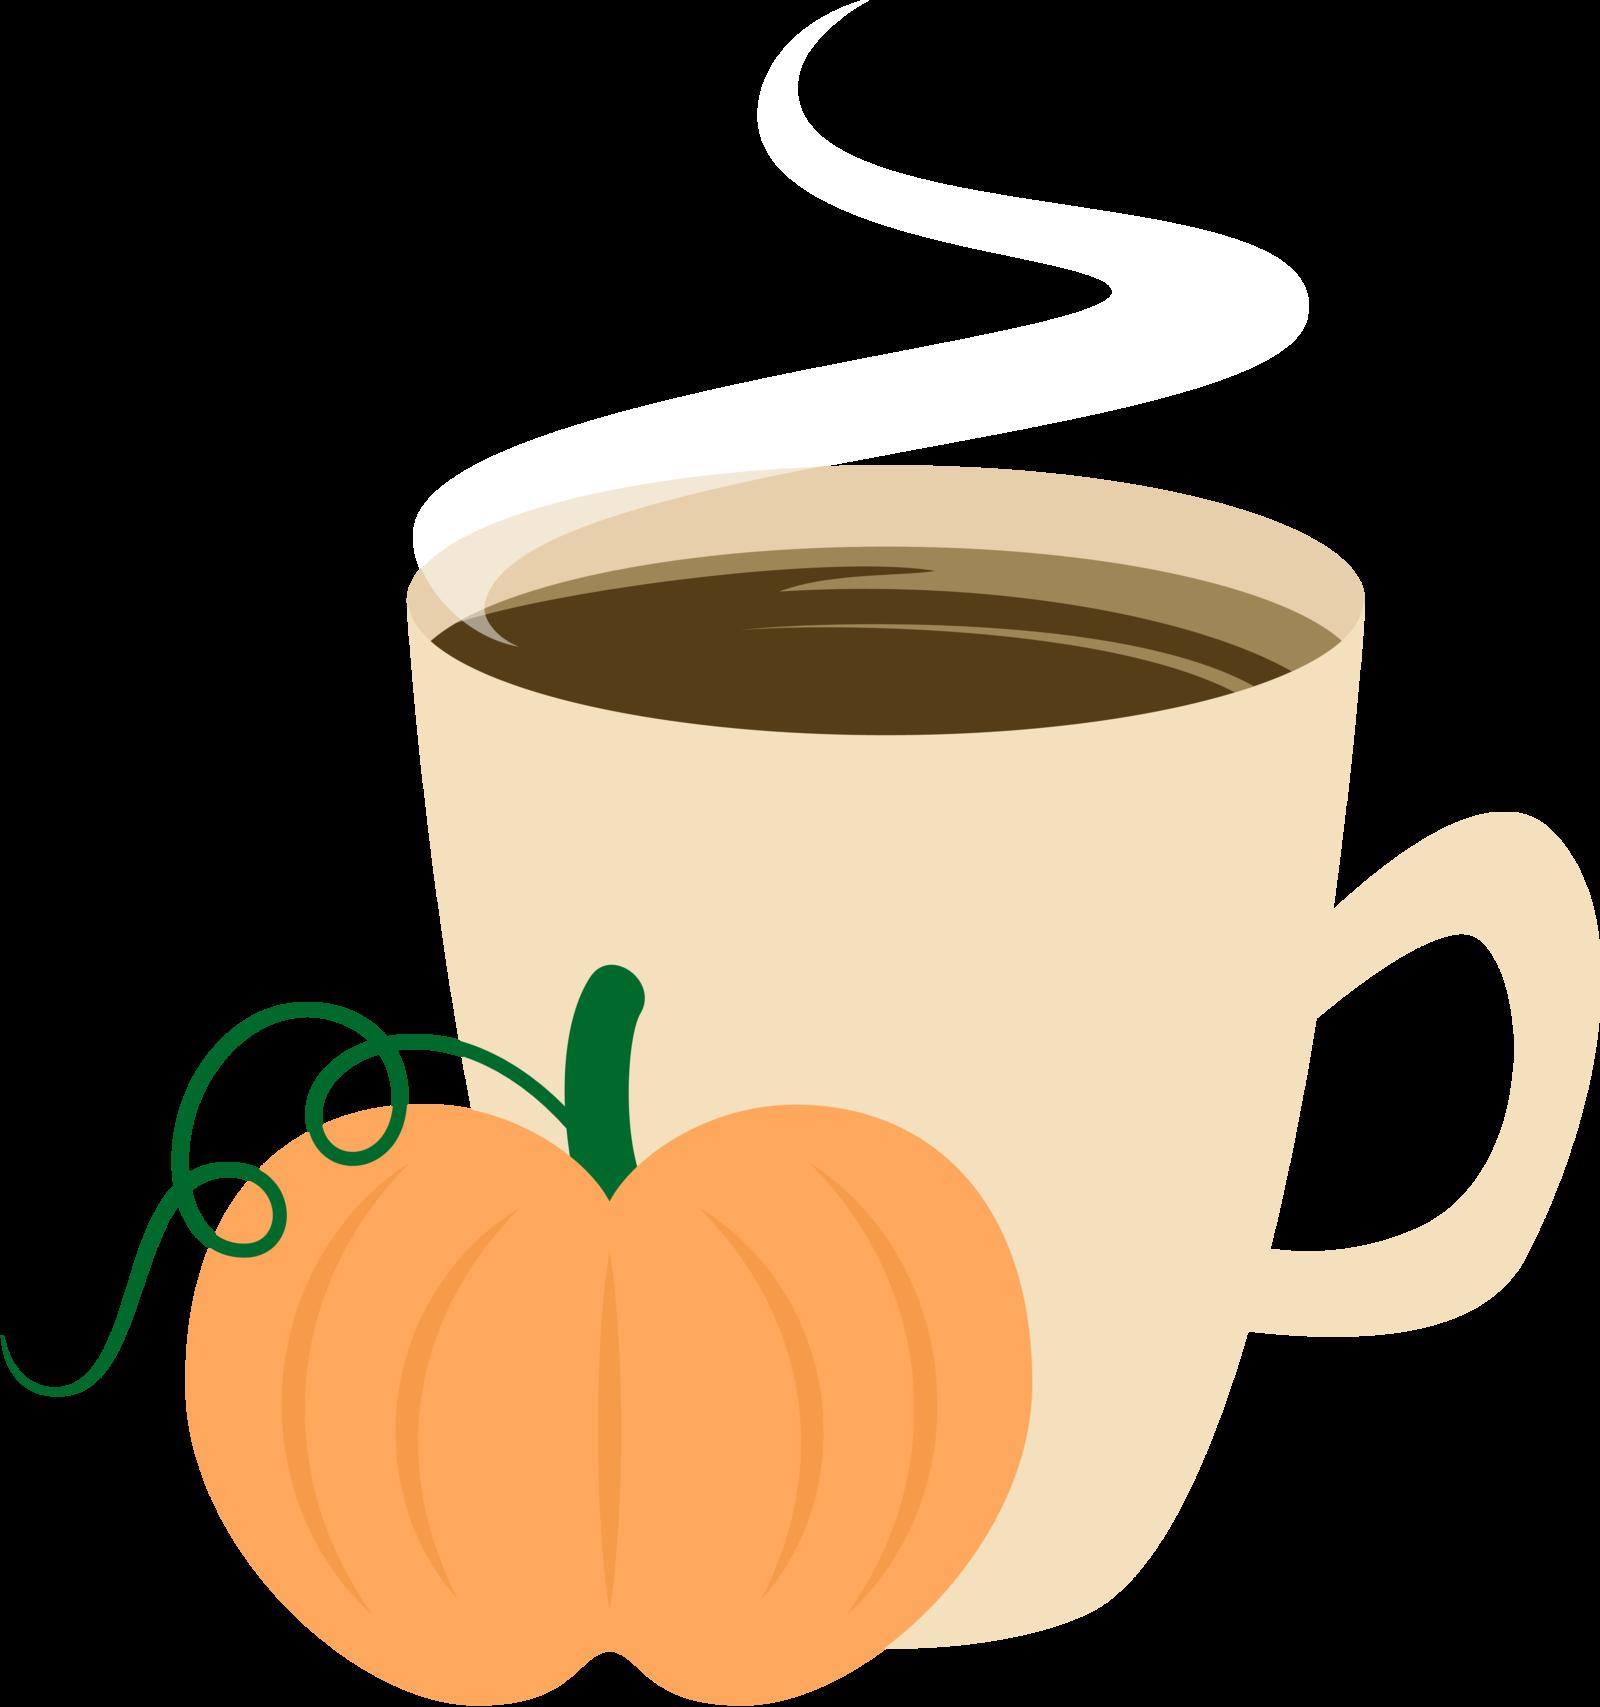 Spice s cutie mark. Clipart pumpkin vector